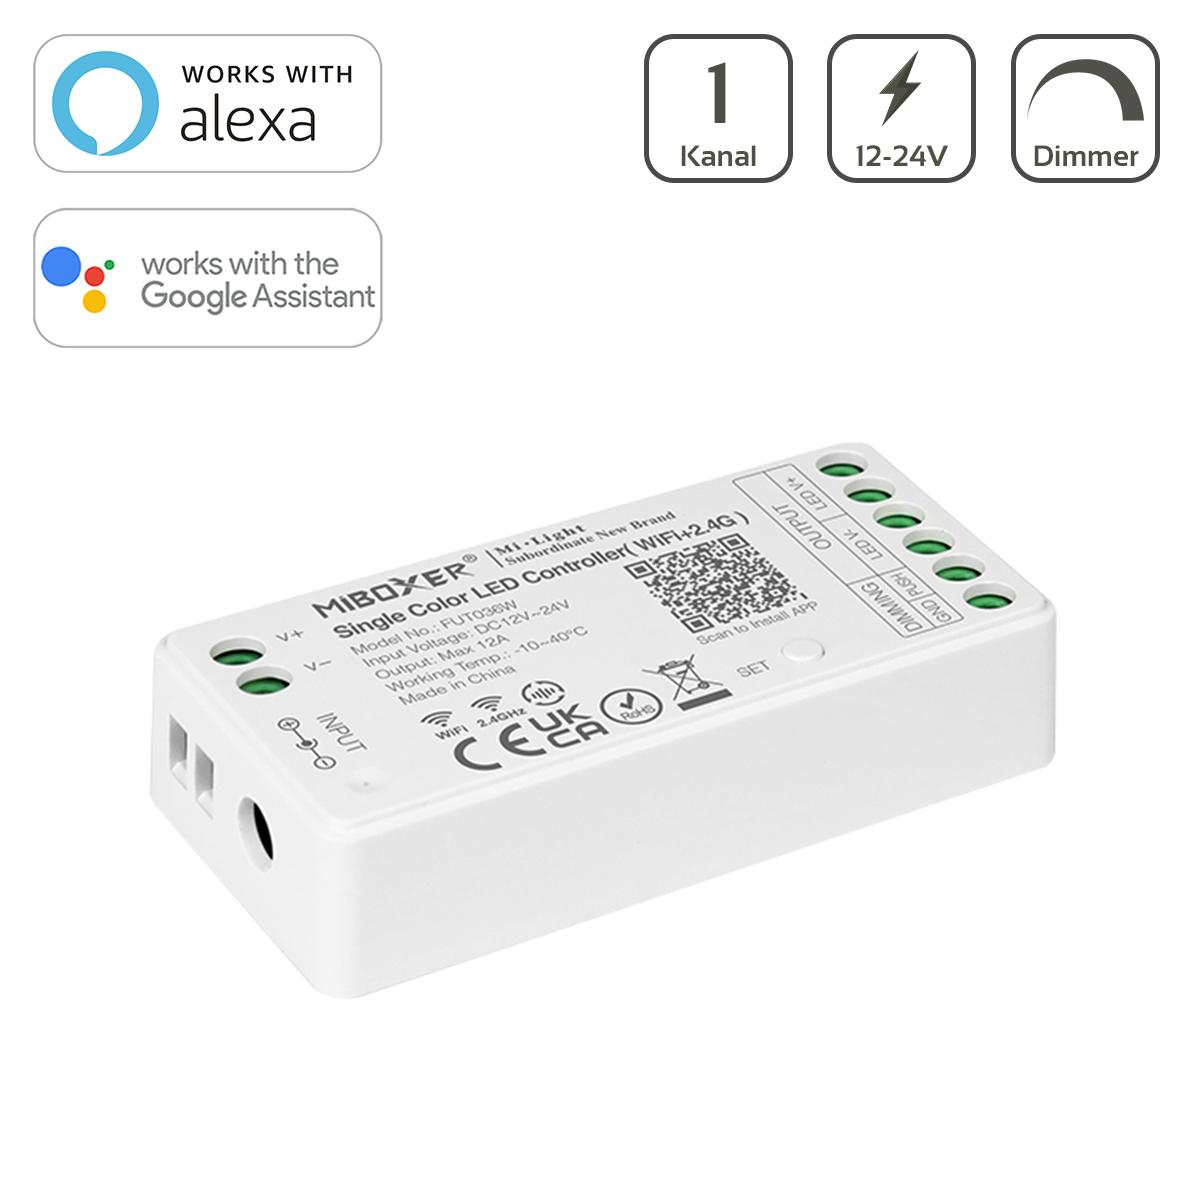 MiBoxer WIFI LED Dimmer 1 Kanal 12/24V LED Strip WiFi Tuya Alexa Google Steuerung FUT036W